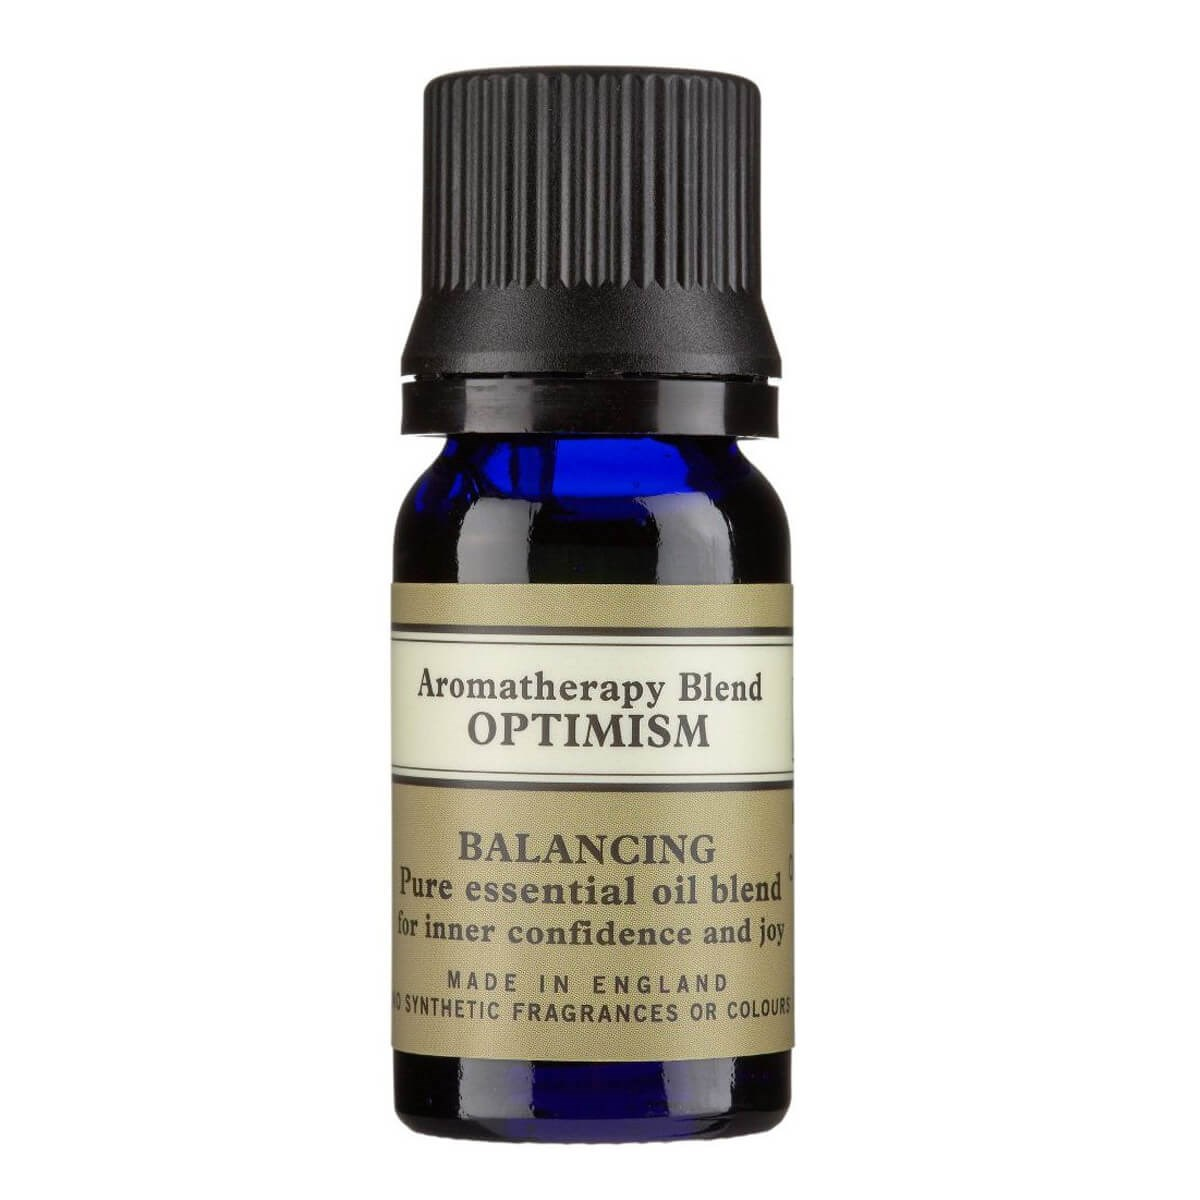 Neal's Yard Remedies Aromatherapy Blend - Optimism